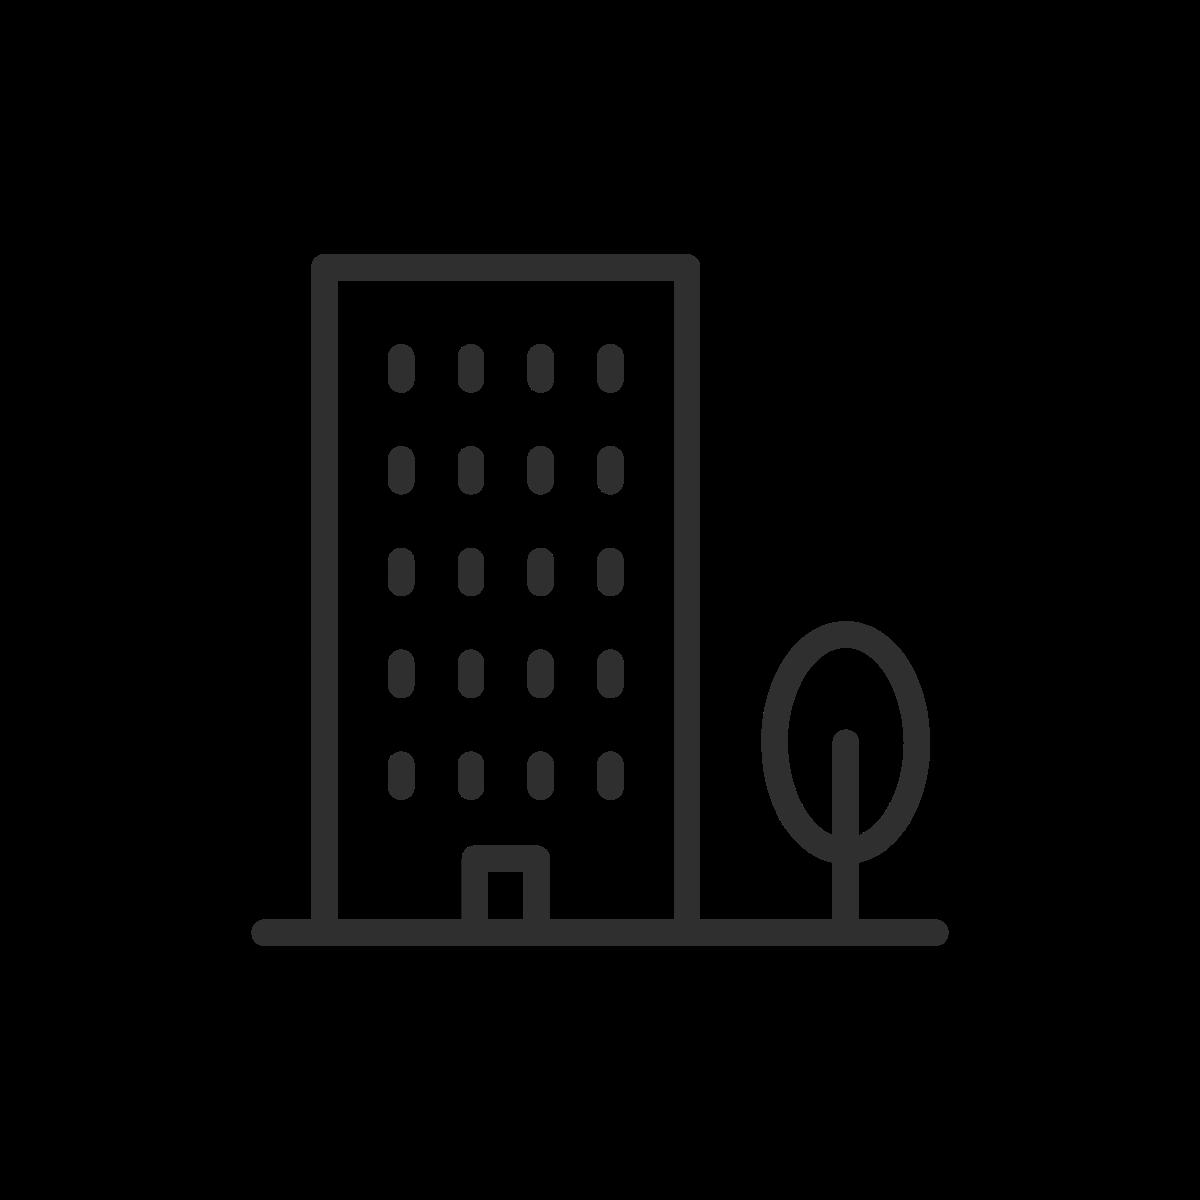 icon-aquisition-company